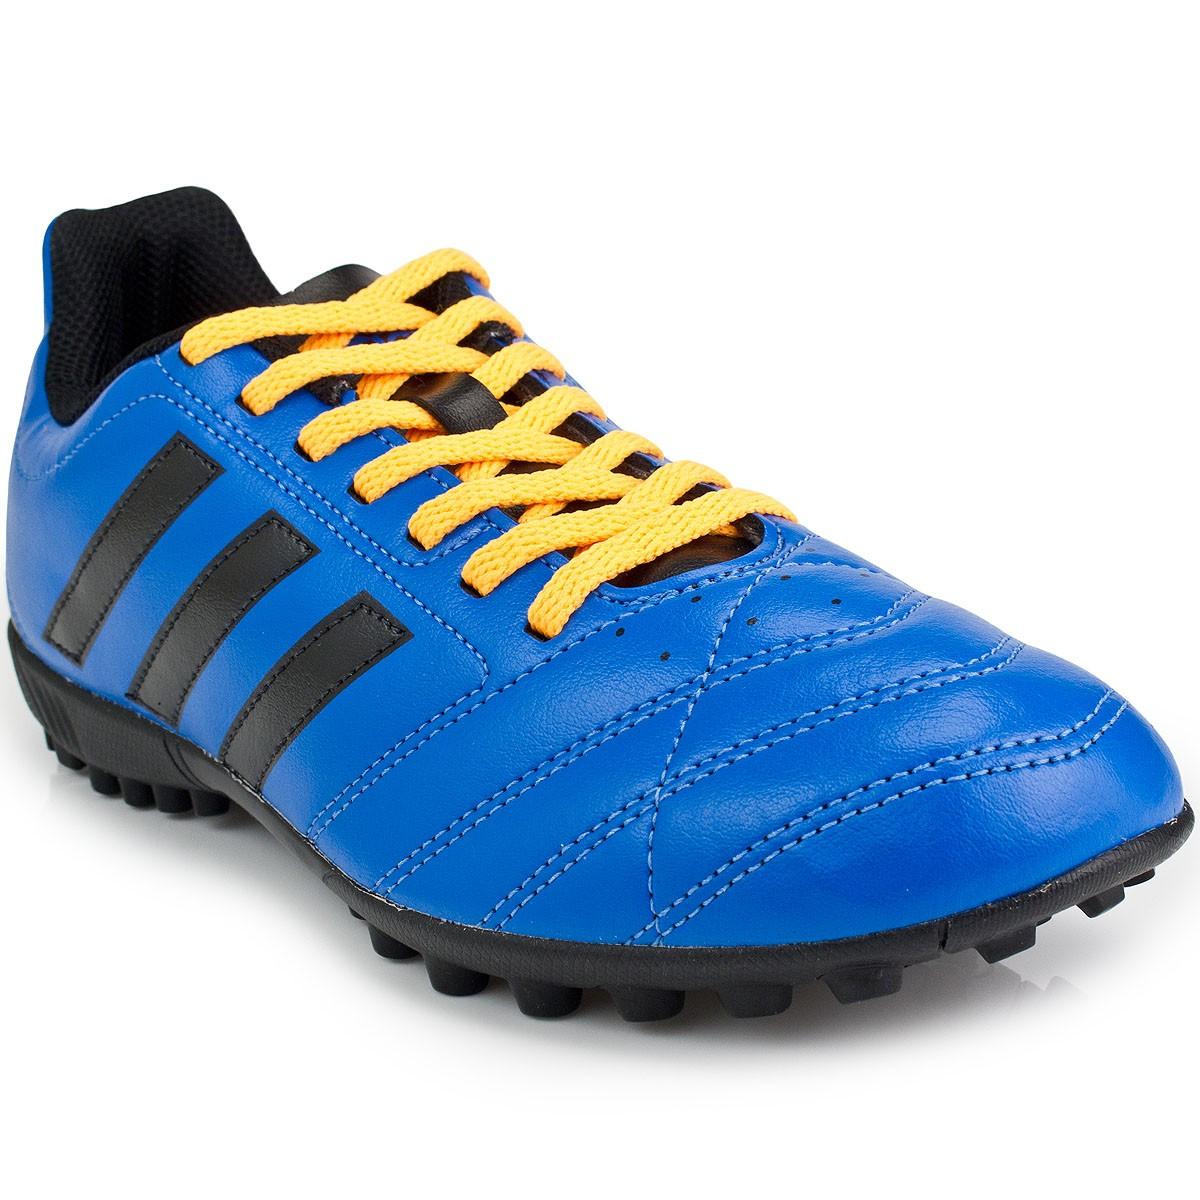 Chuteira Adidas Goletto 5 TF  3ee46a86f2a8d